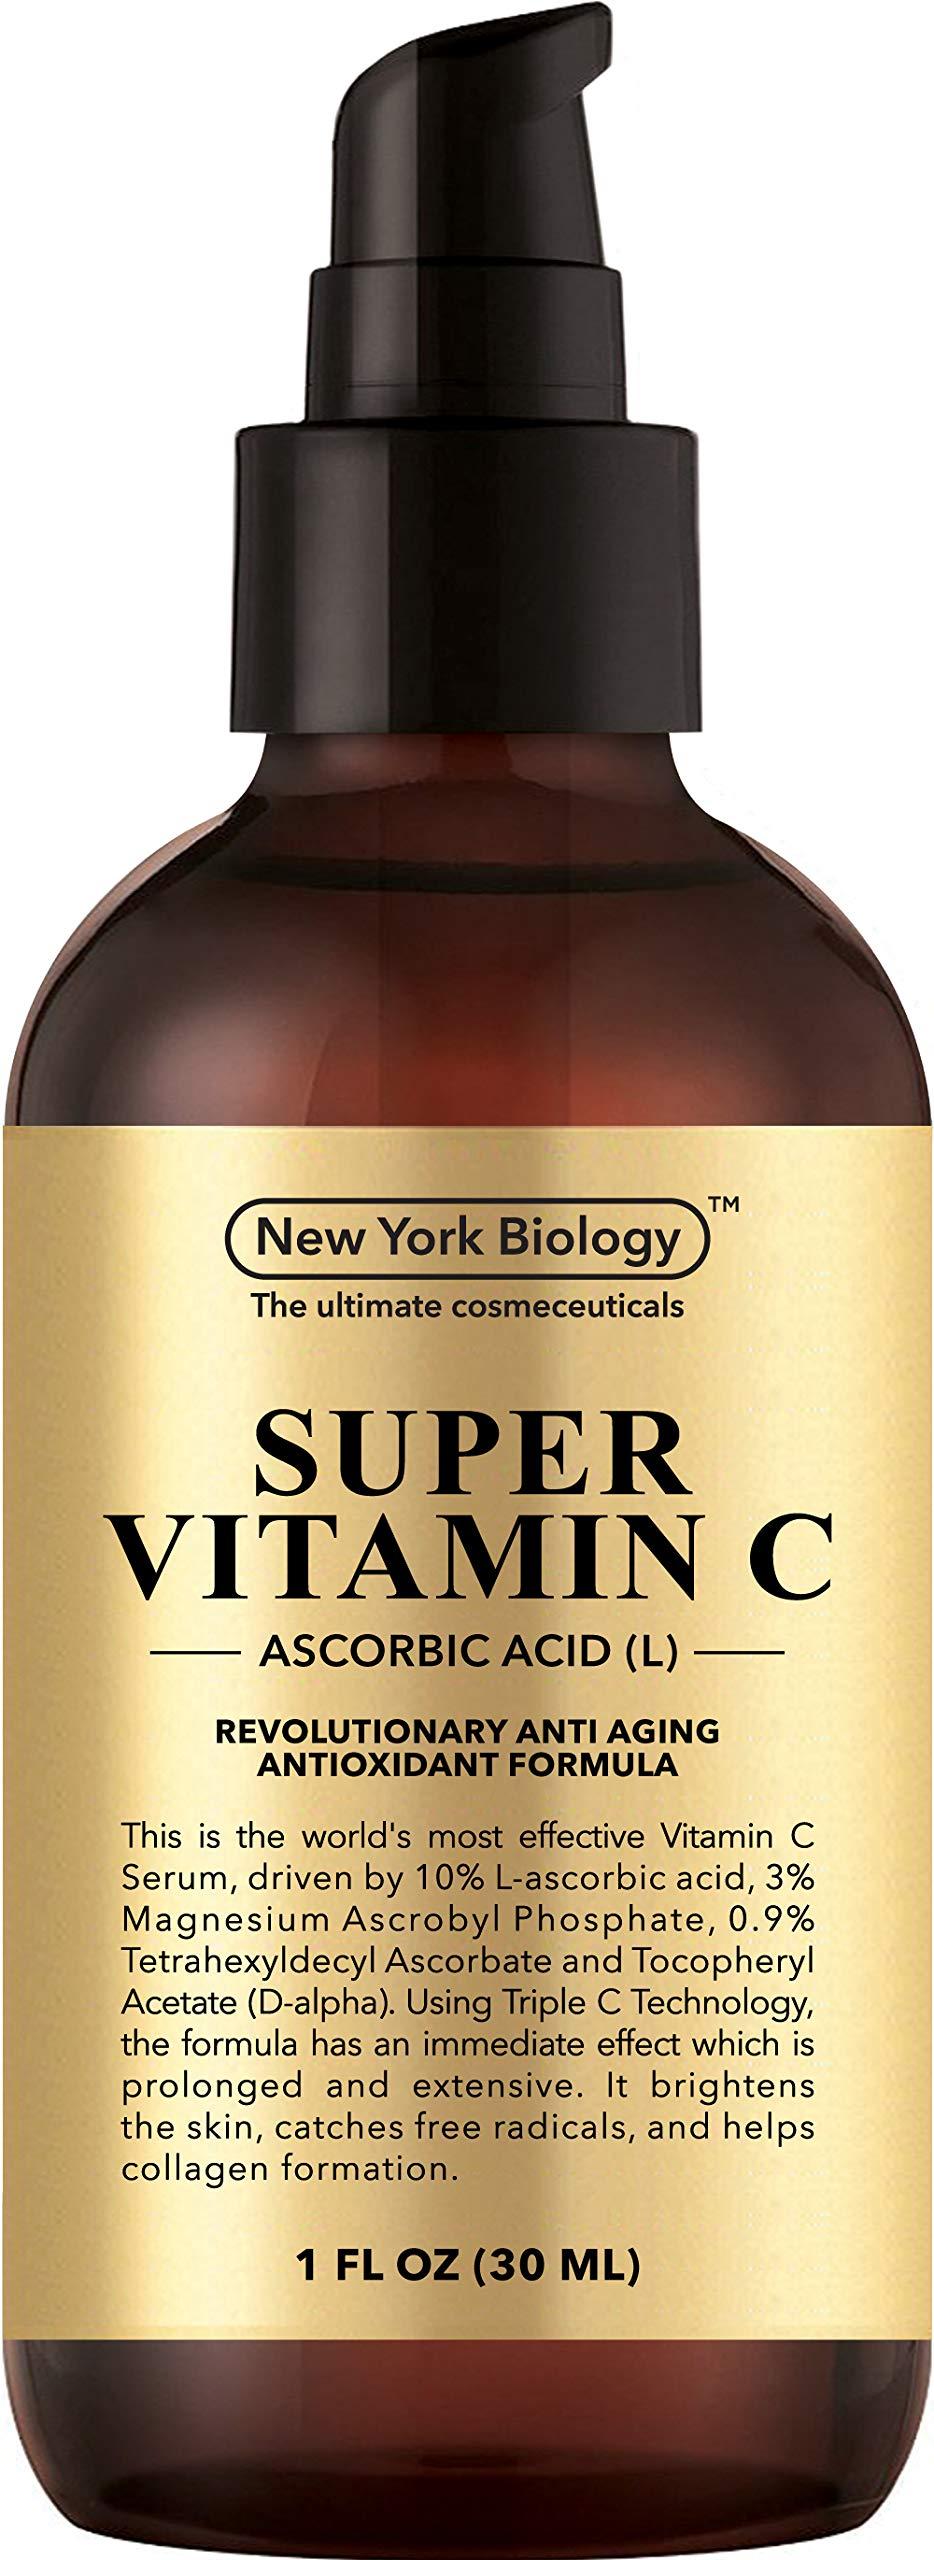 Super Vitamin C Serum for Face - 6X Stronger Than 20% Serum - Highest Professional Grade w/L Ascorbic Acid - 1 FL OZ